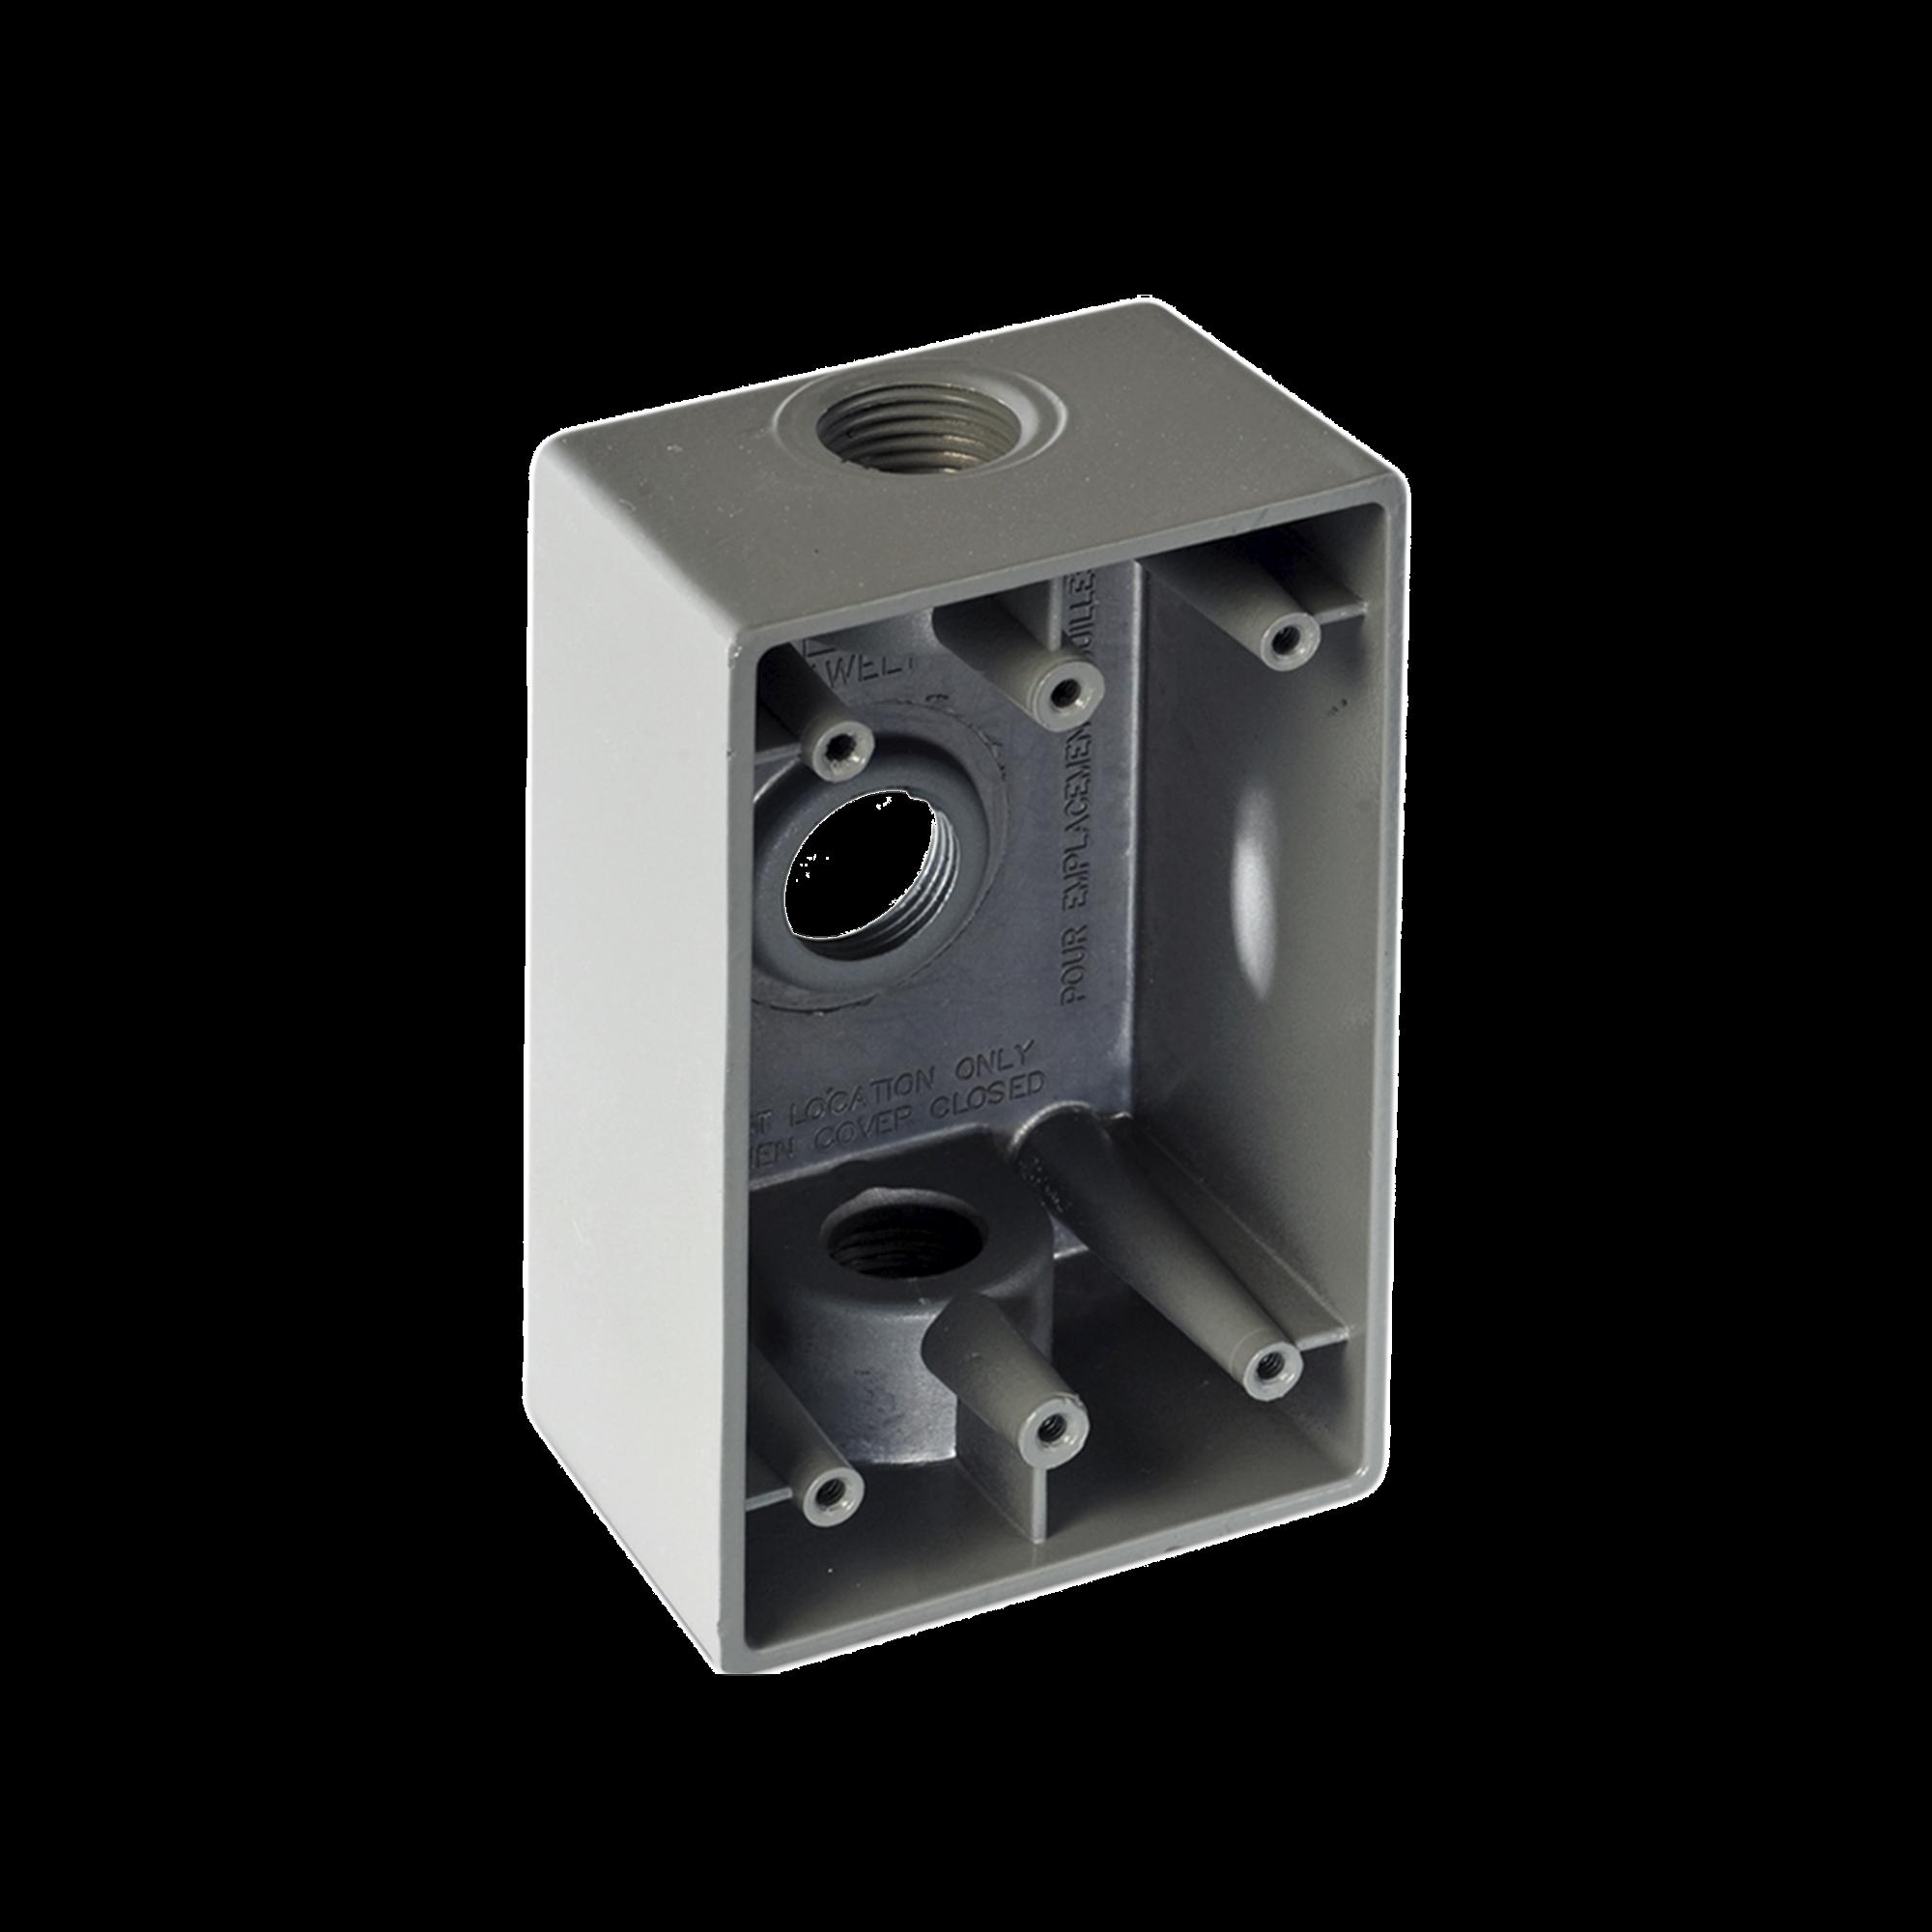 Caja Condulet FS de 1/2 (12.7 mm) con tres bocas a prueba de intemperie.